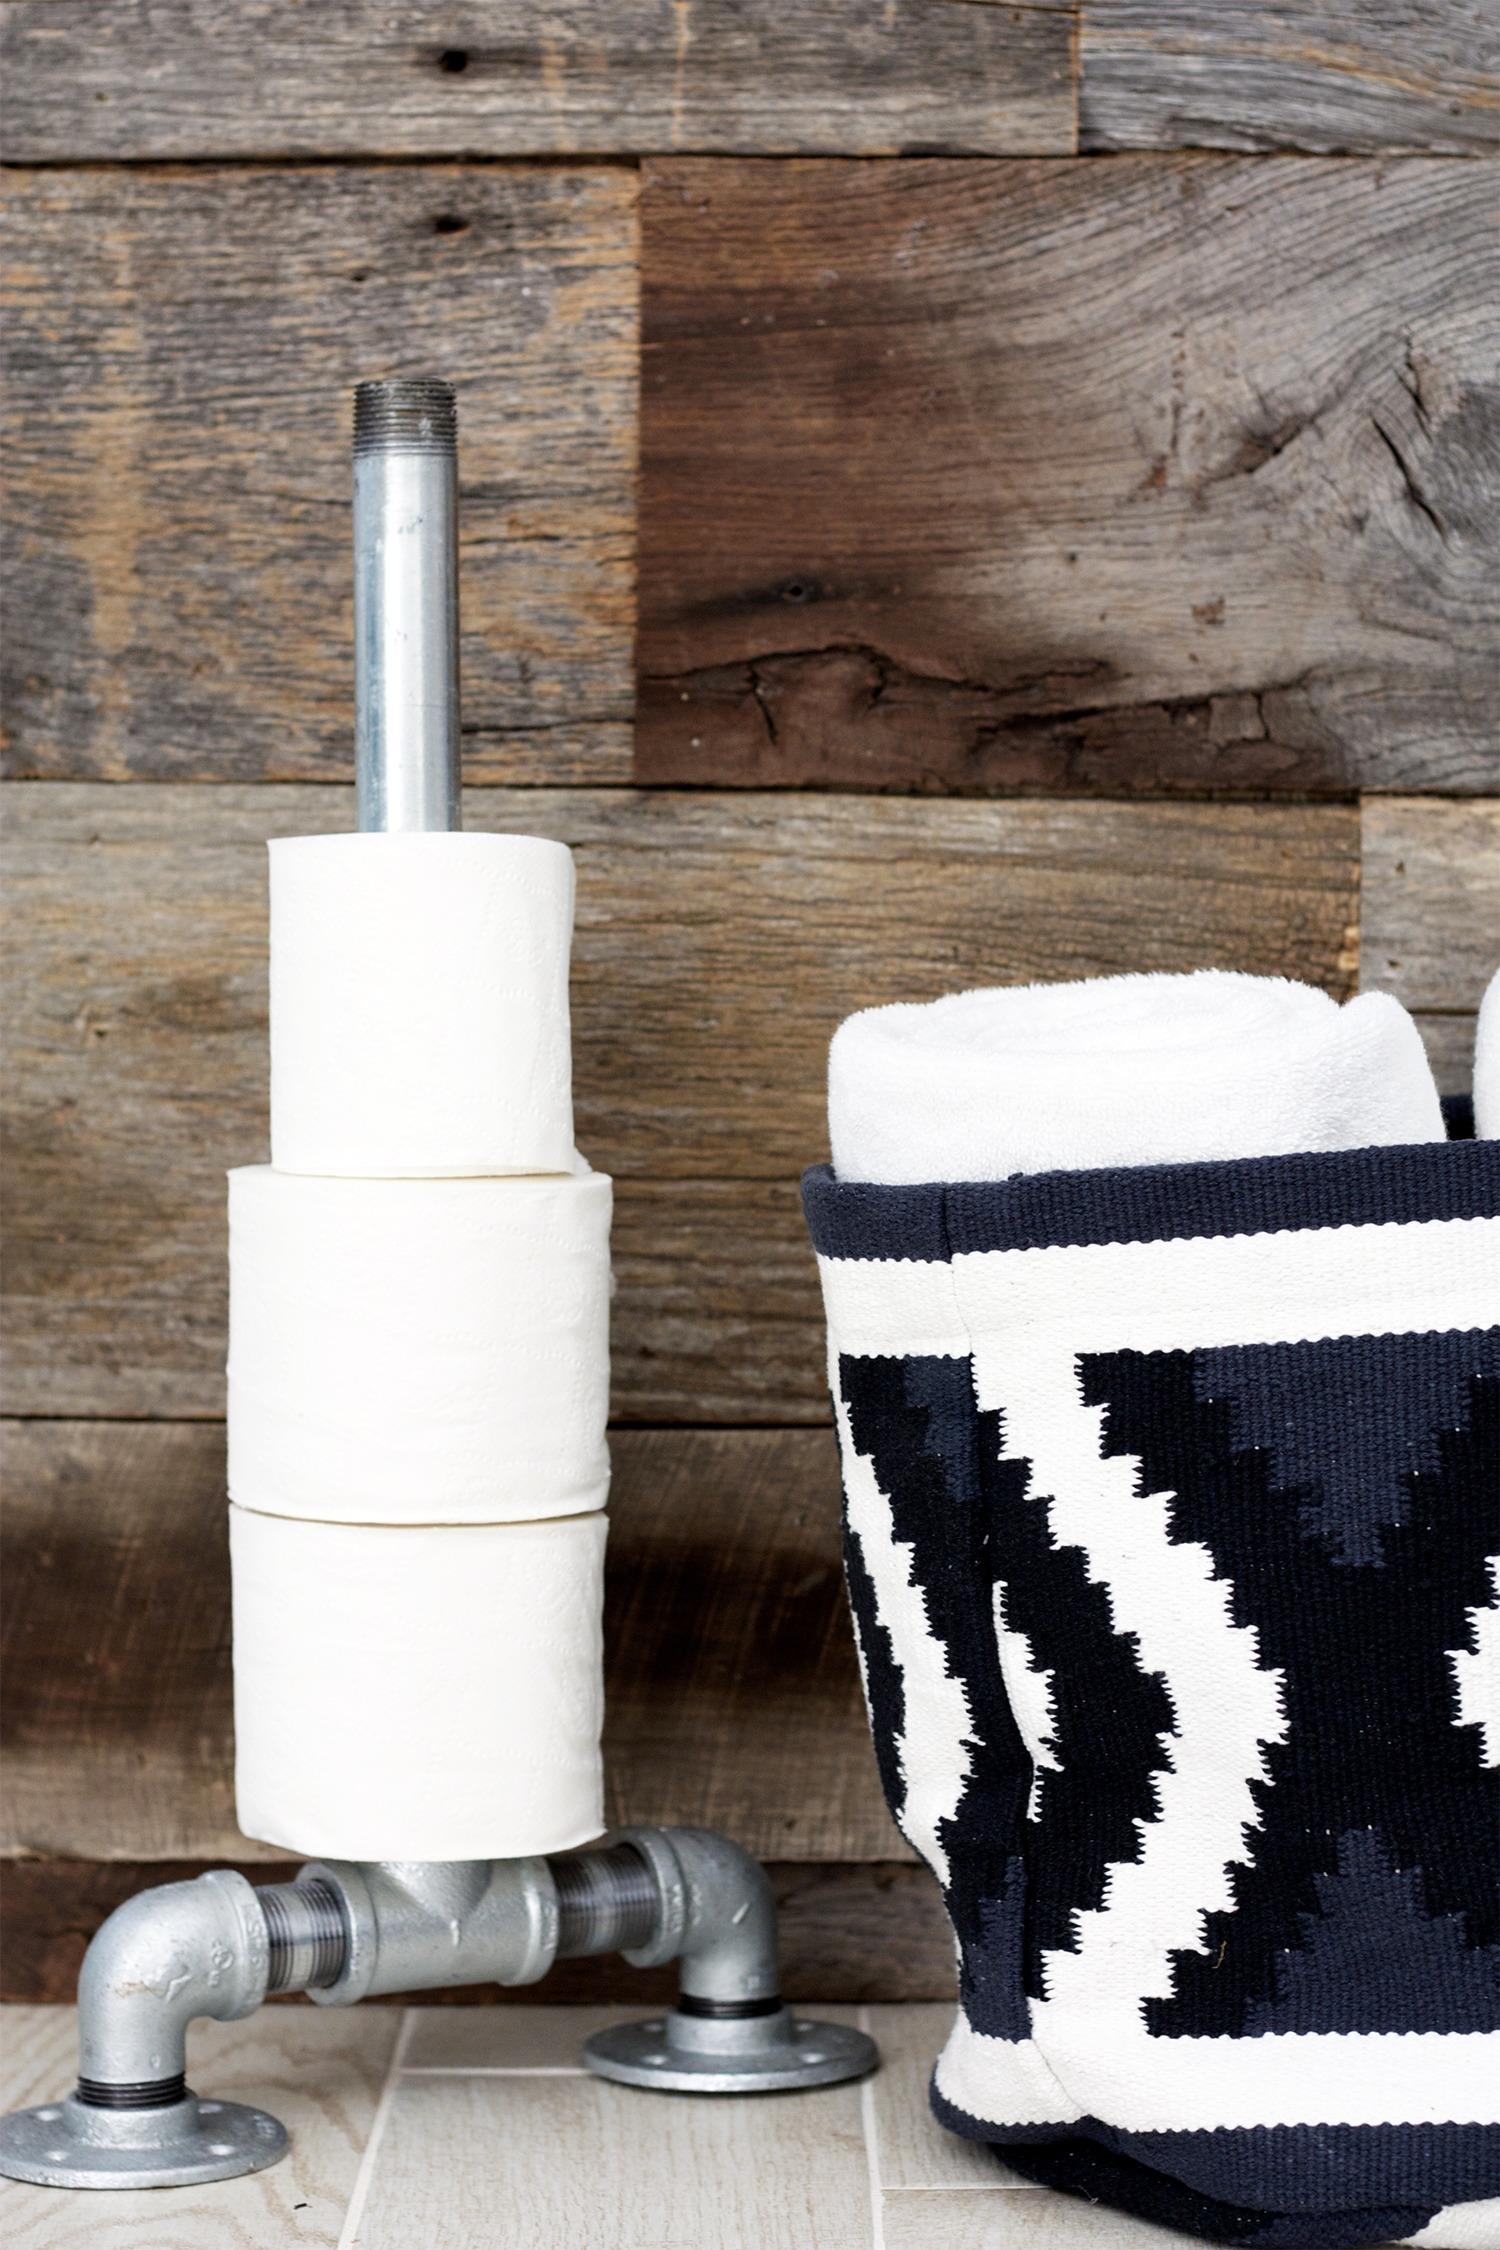 Industrial DIY Toilet Paper Holder